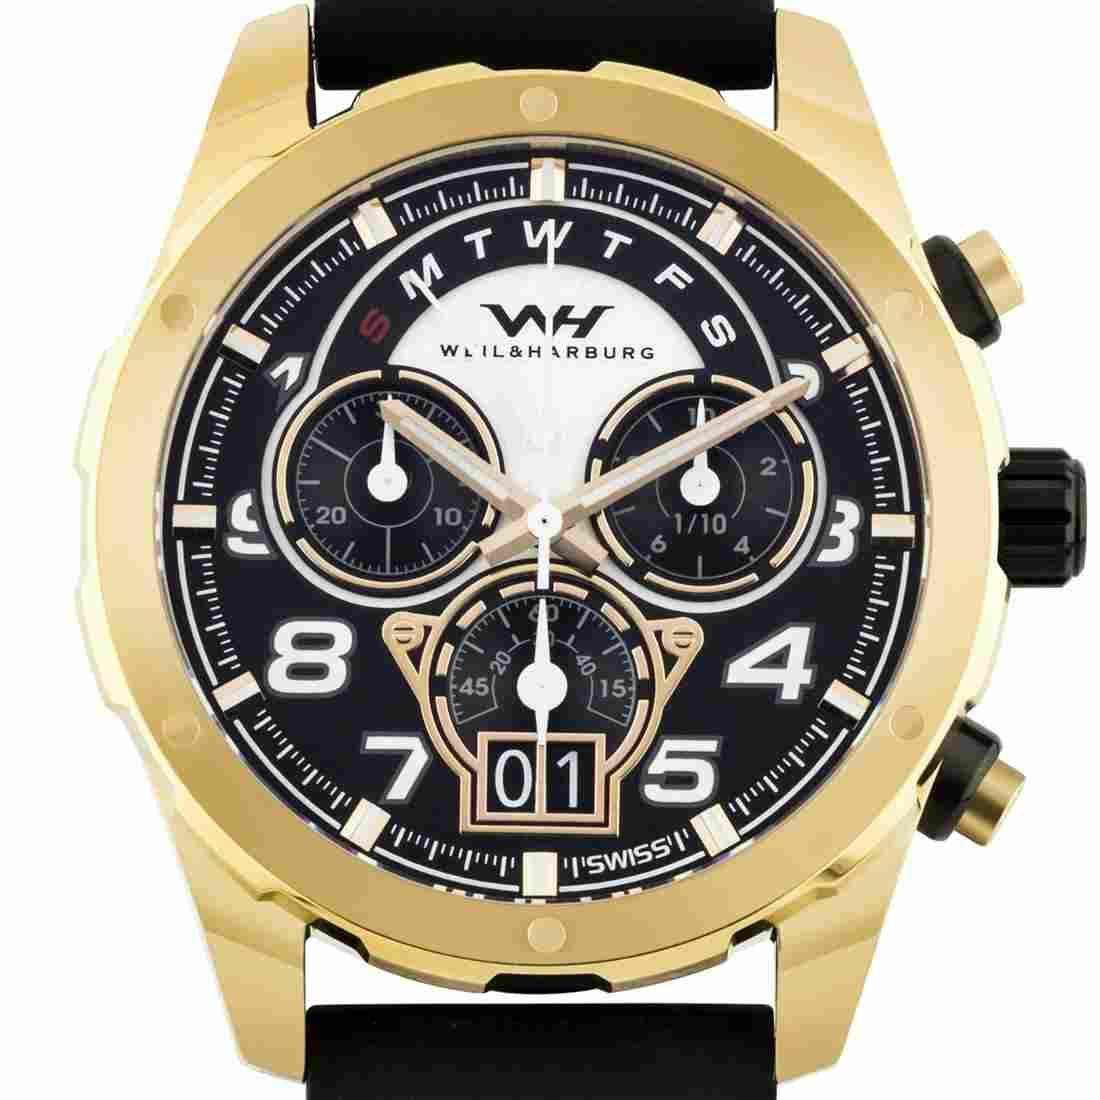 Weil & Harburg Swiss Chronograph Hardy Men's Watch